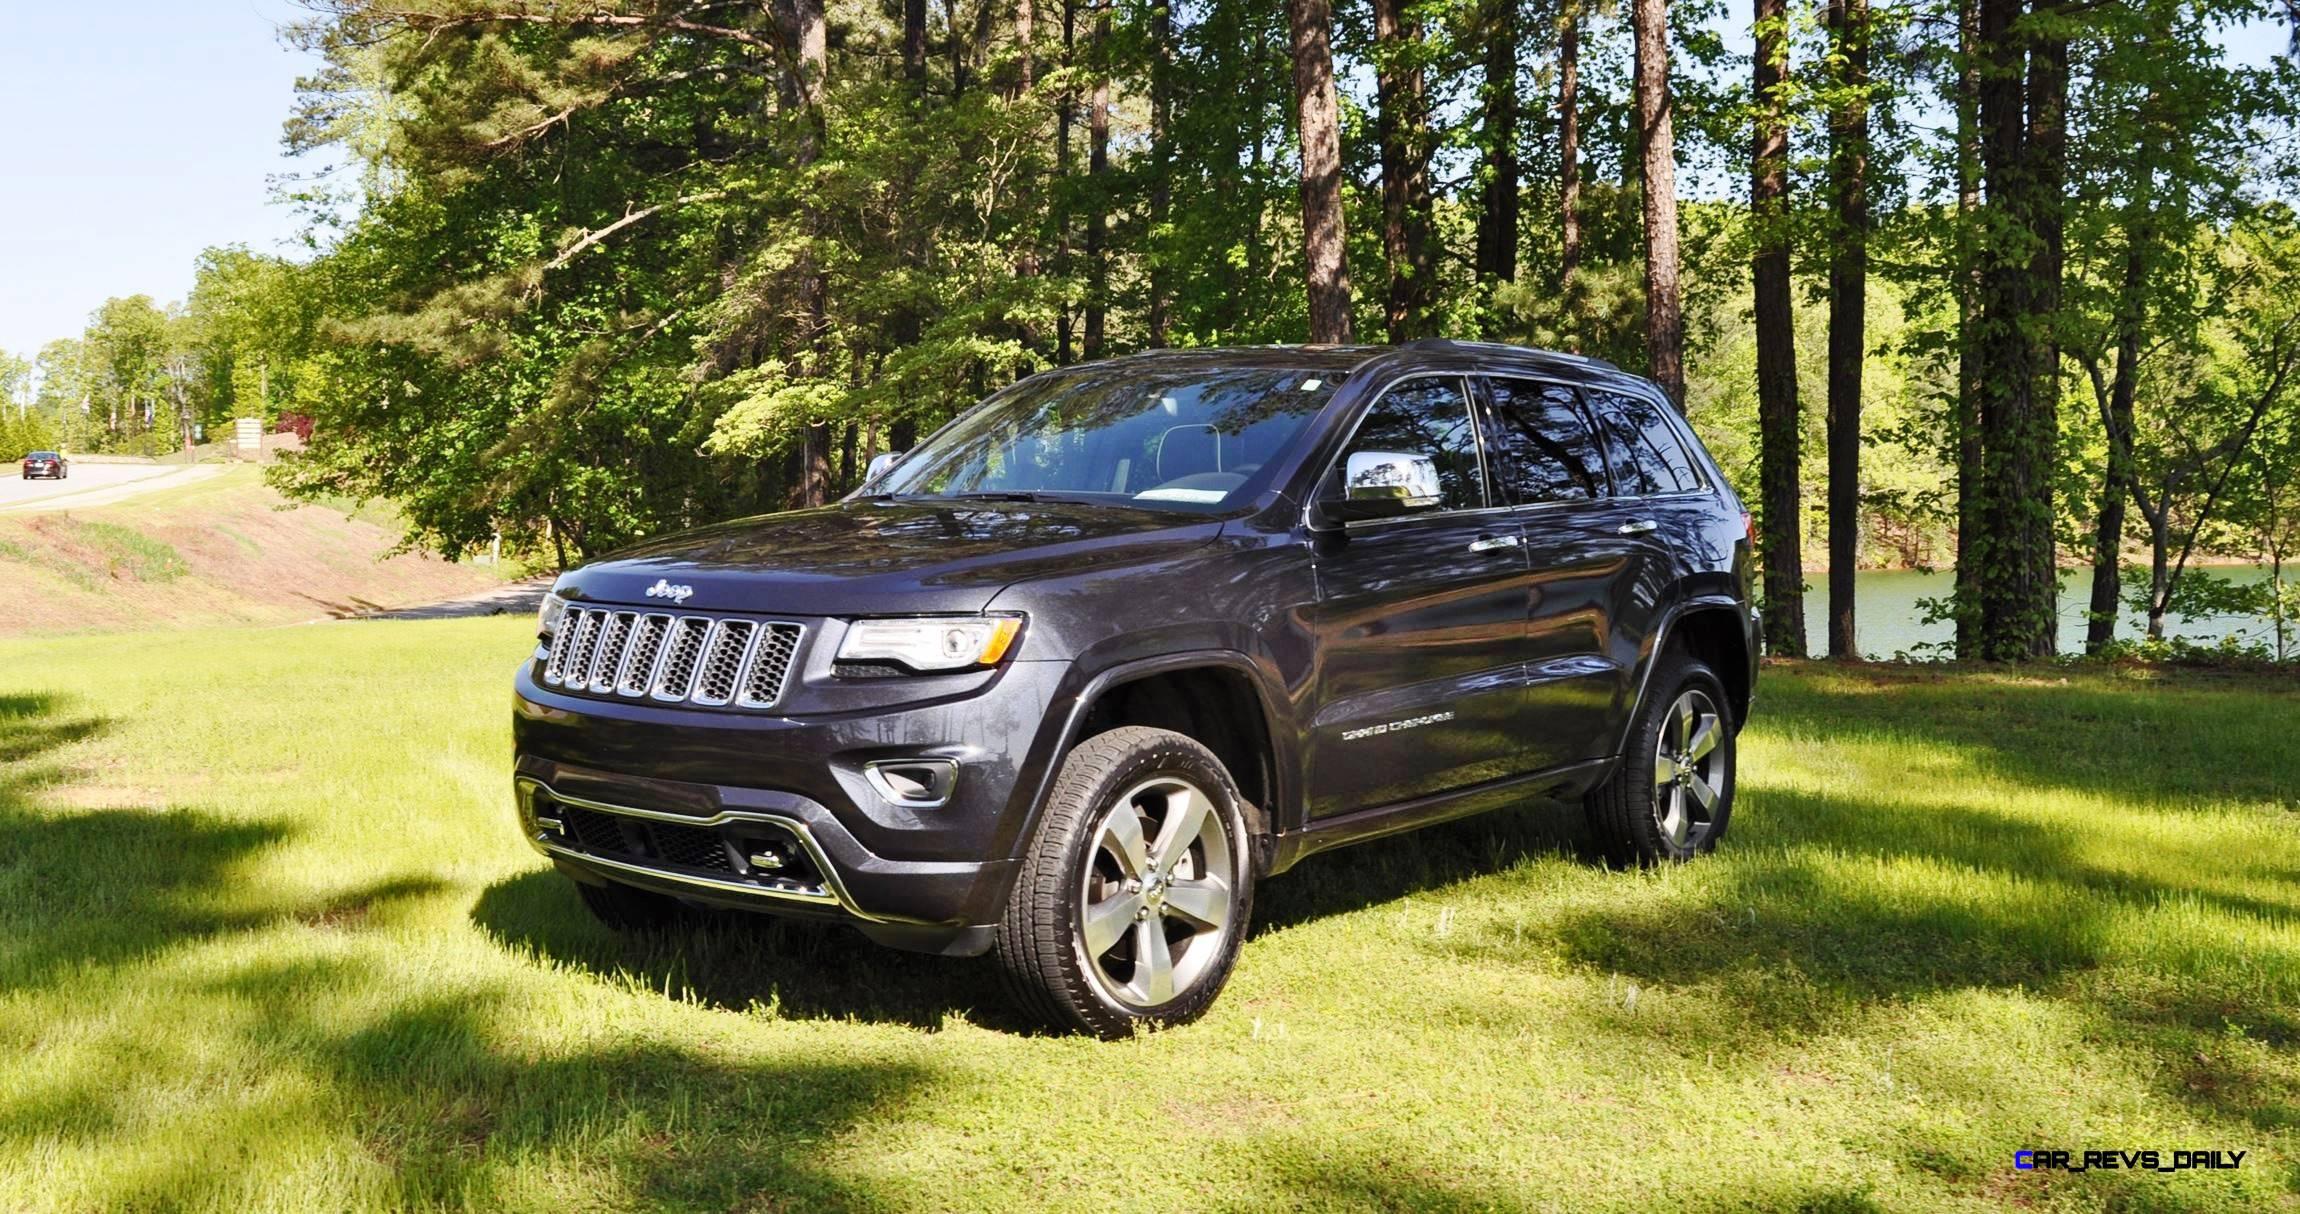 2015 jeep grand cherokee ecodiesel 39. Black Bedroom Furniture Sets. Home Design Ideas